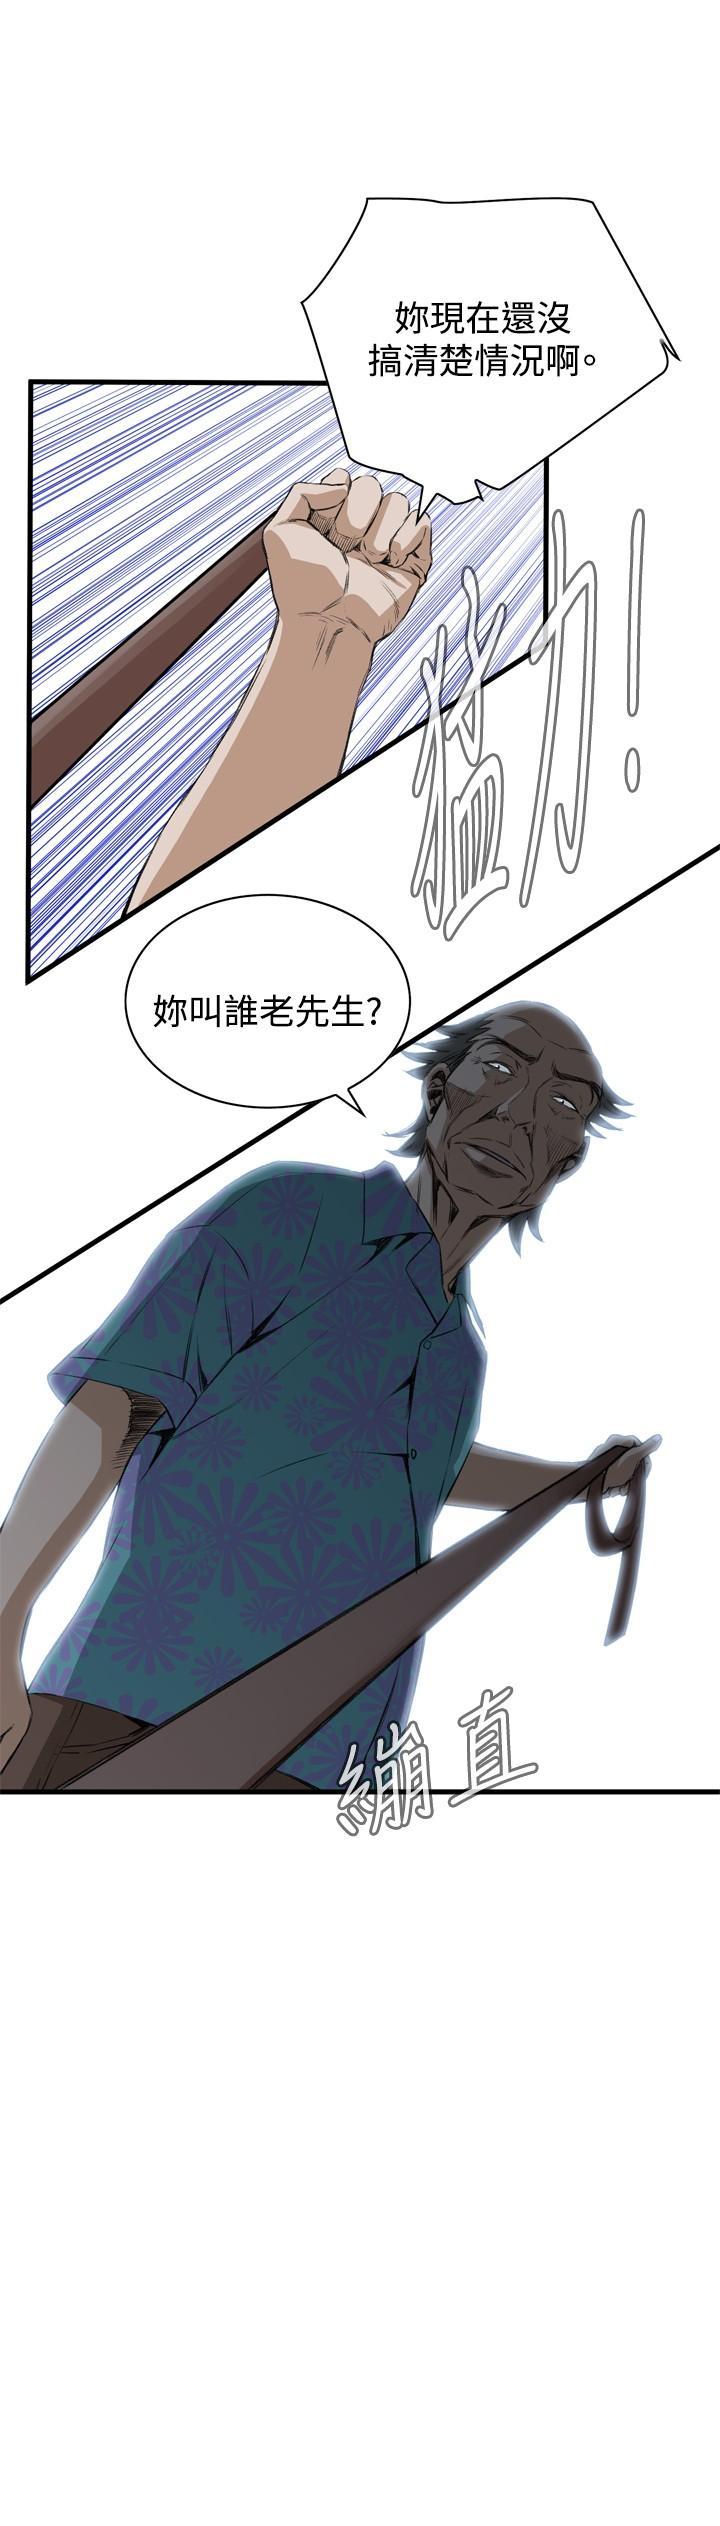 Take a Peek 偷窥 Ch.39~55 [Chinese]中文 269